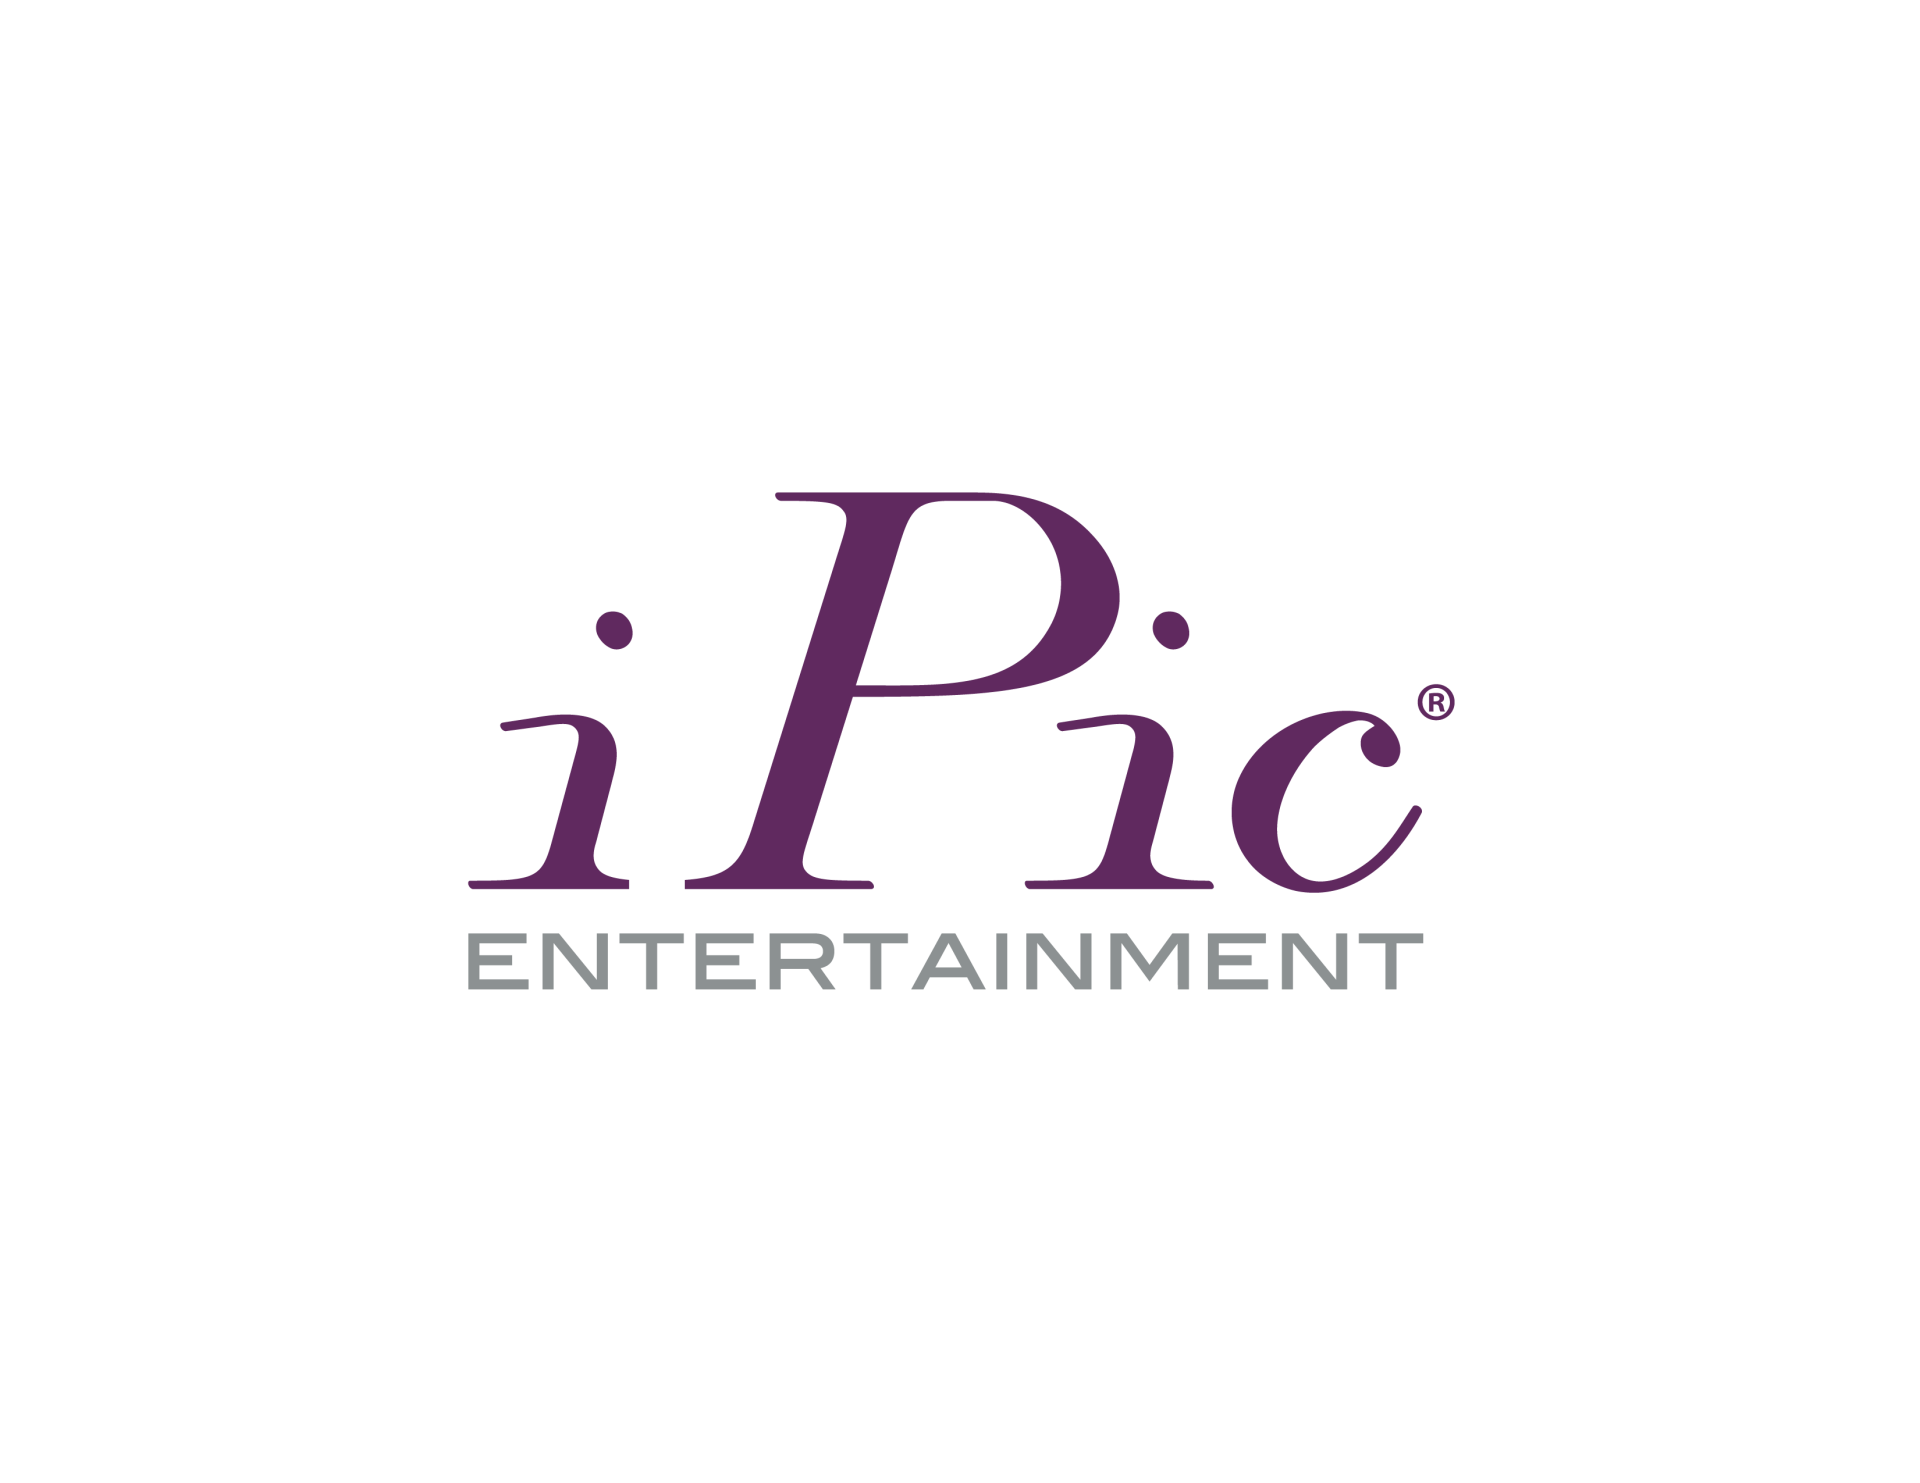 iPic Entertainment